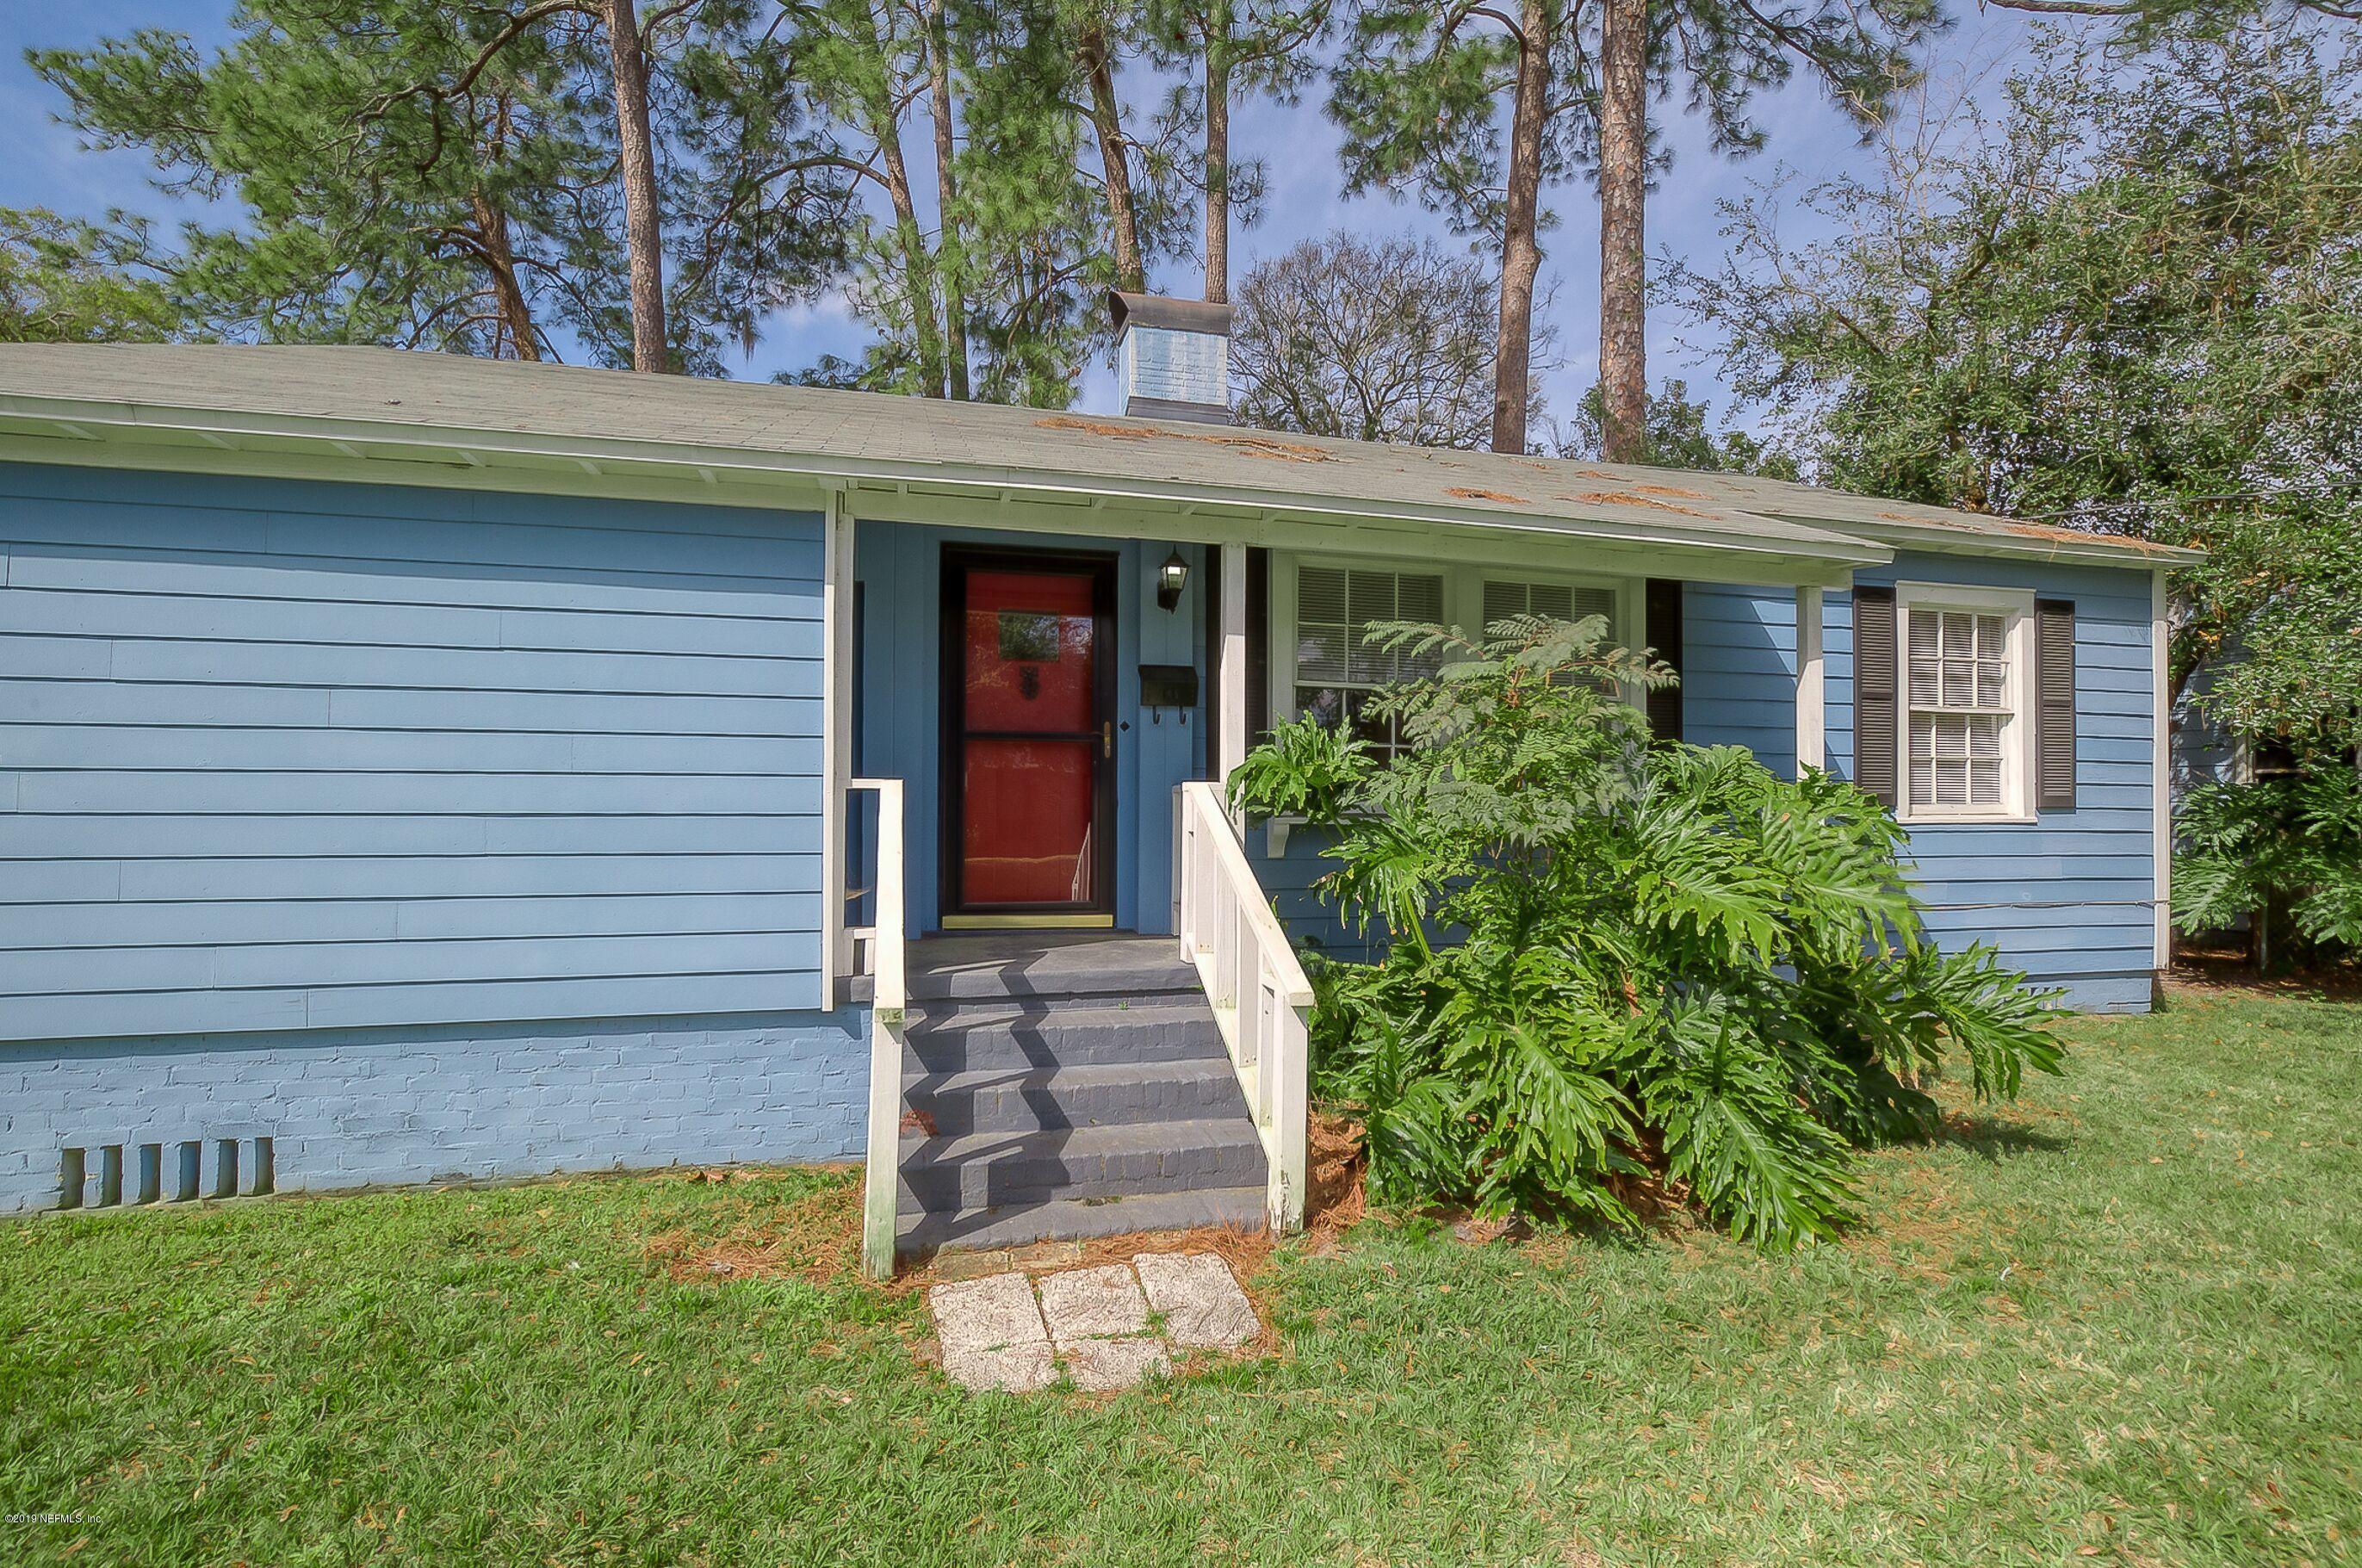 Photo of 2262 REDFERN, JACKSONVILLE, FL 32207